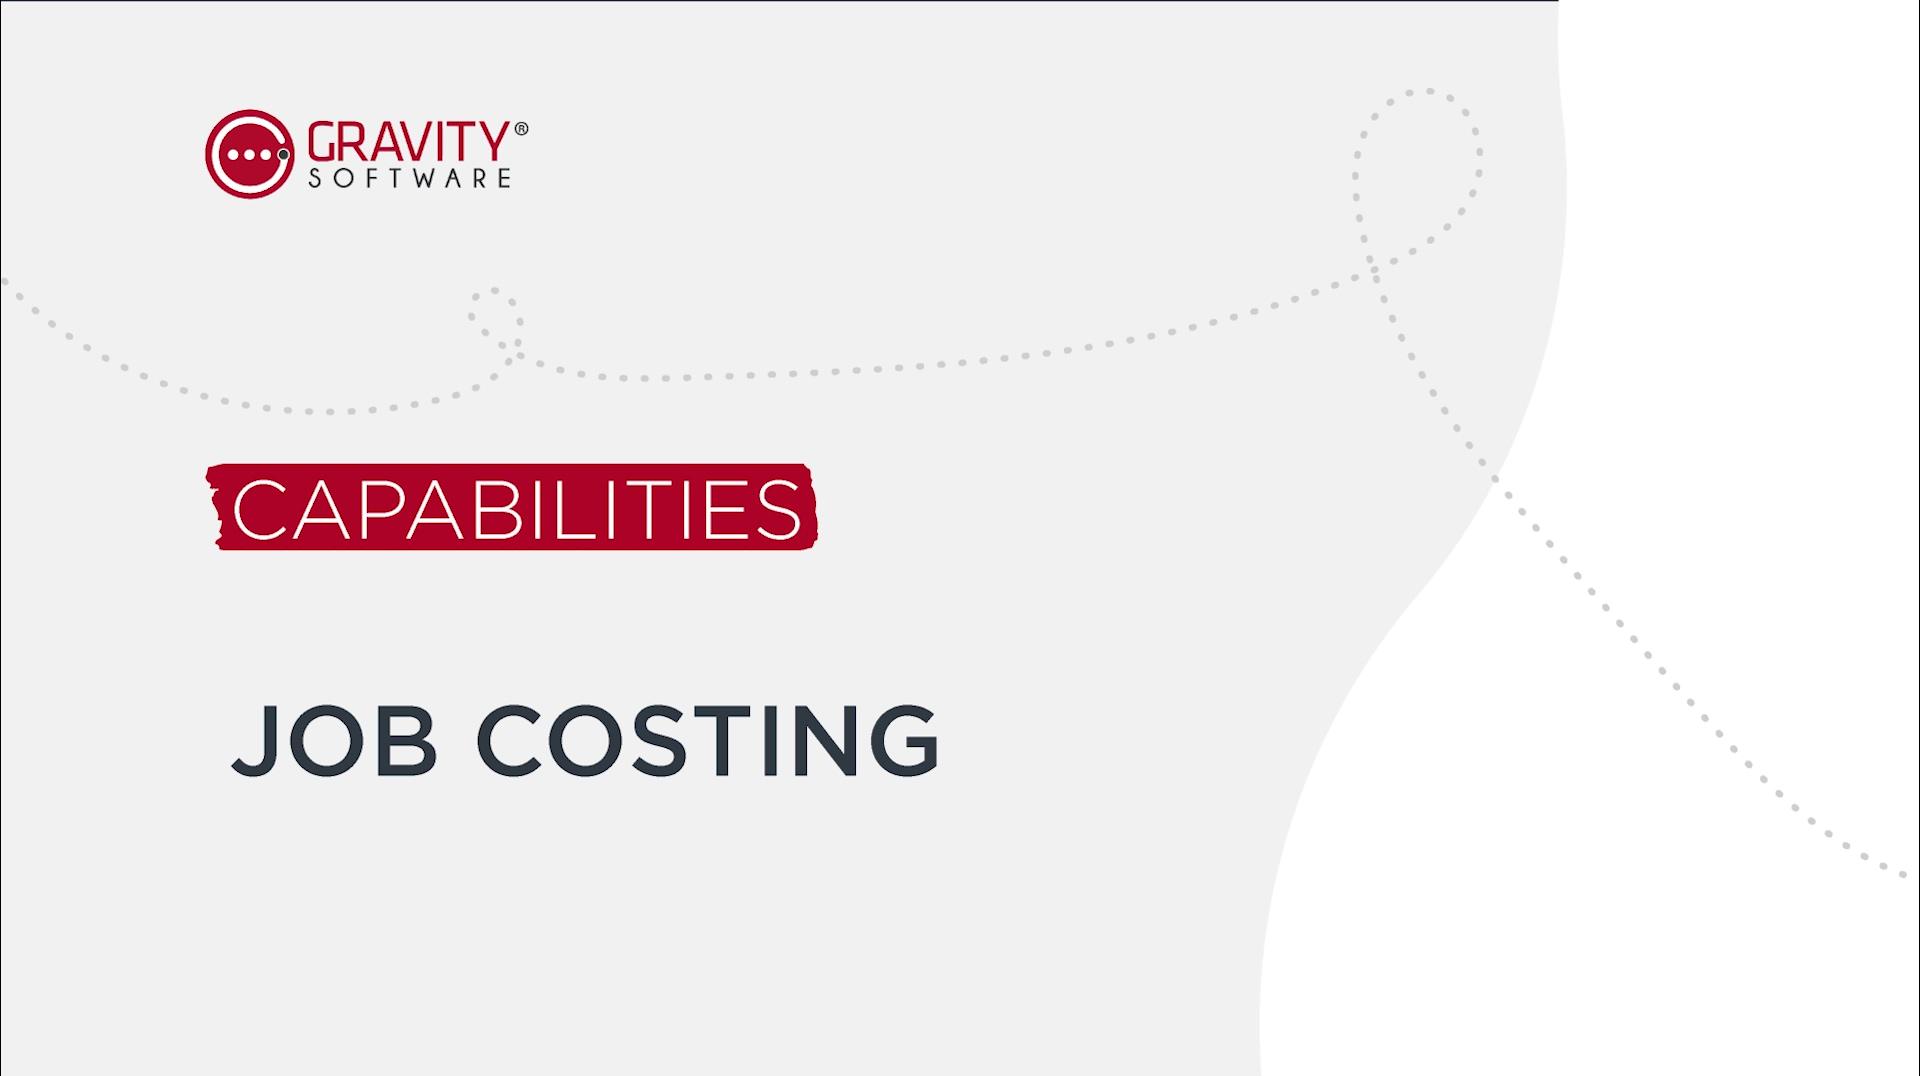 Gravity Software Job Costing